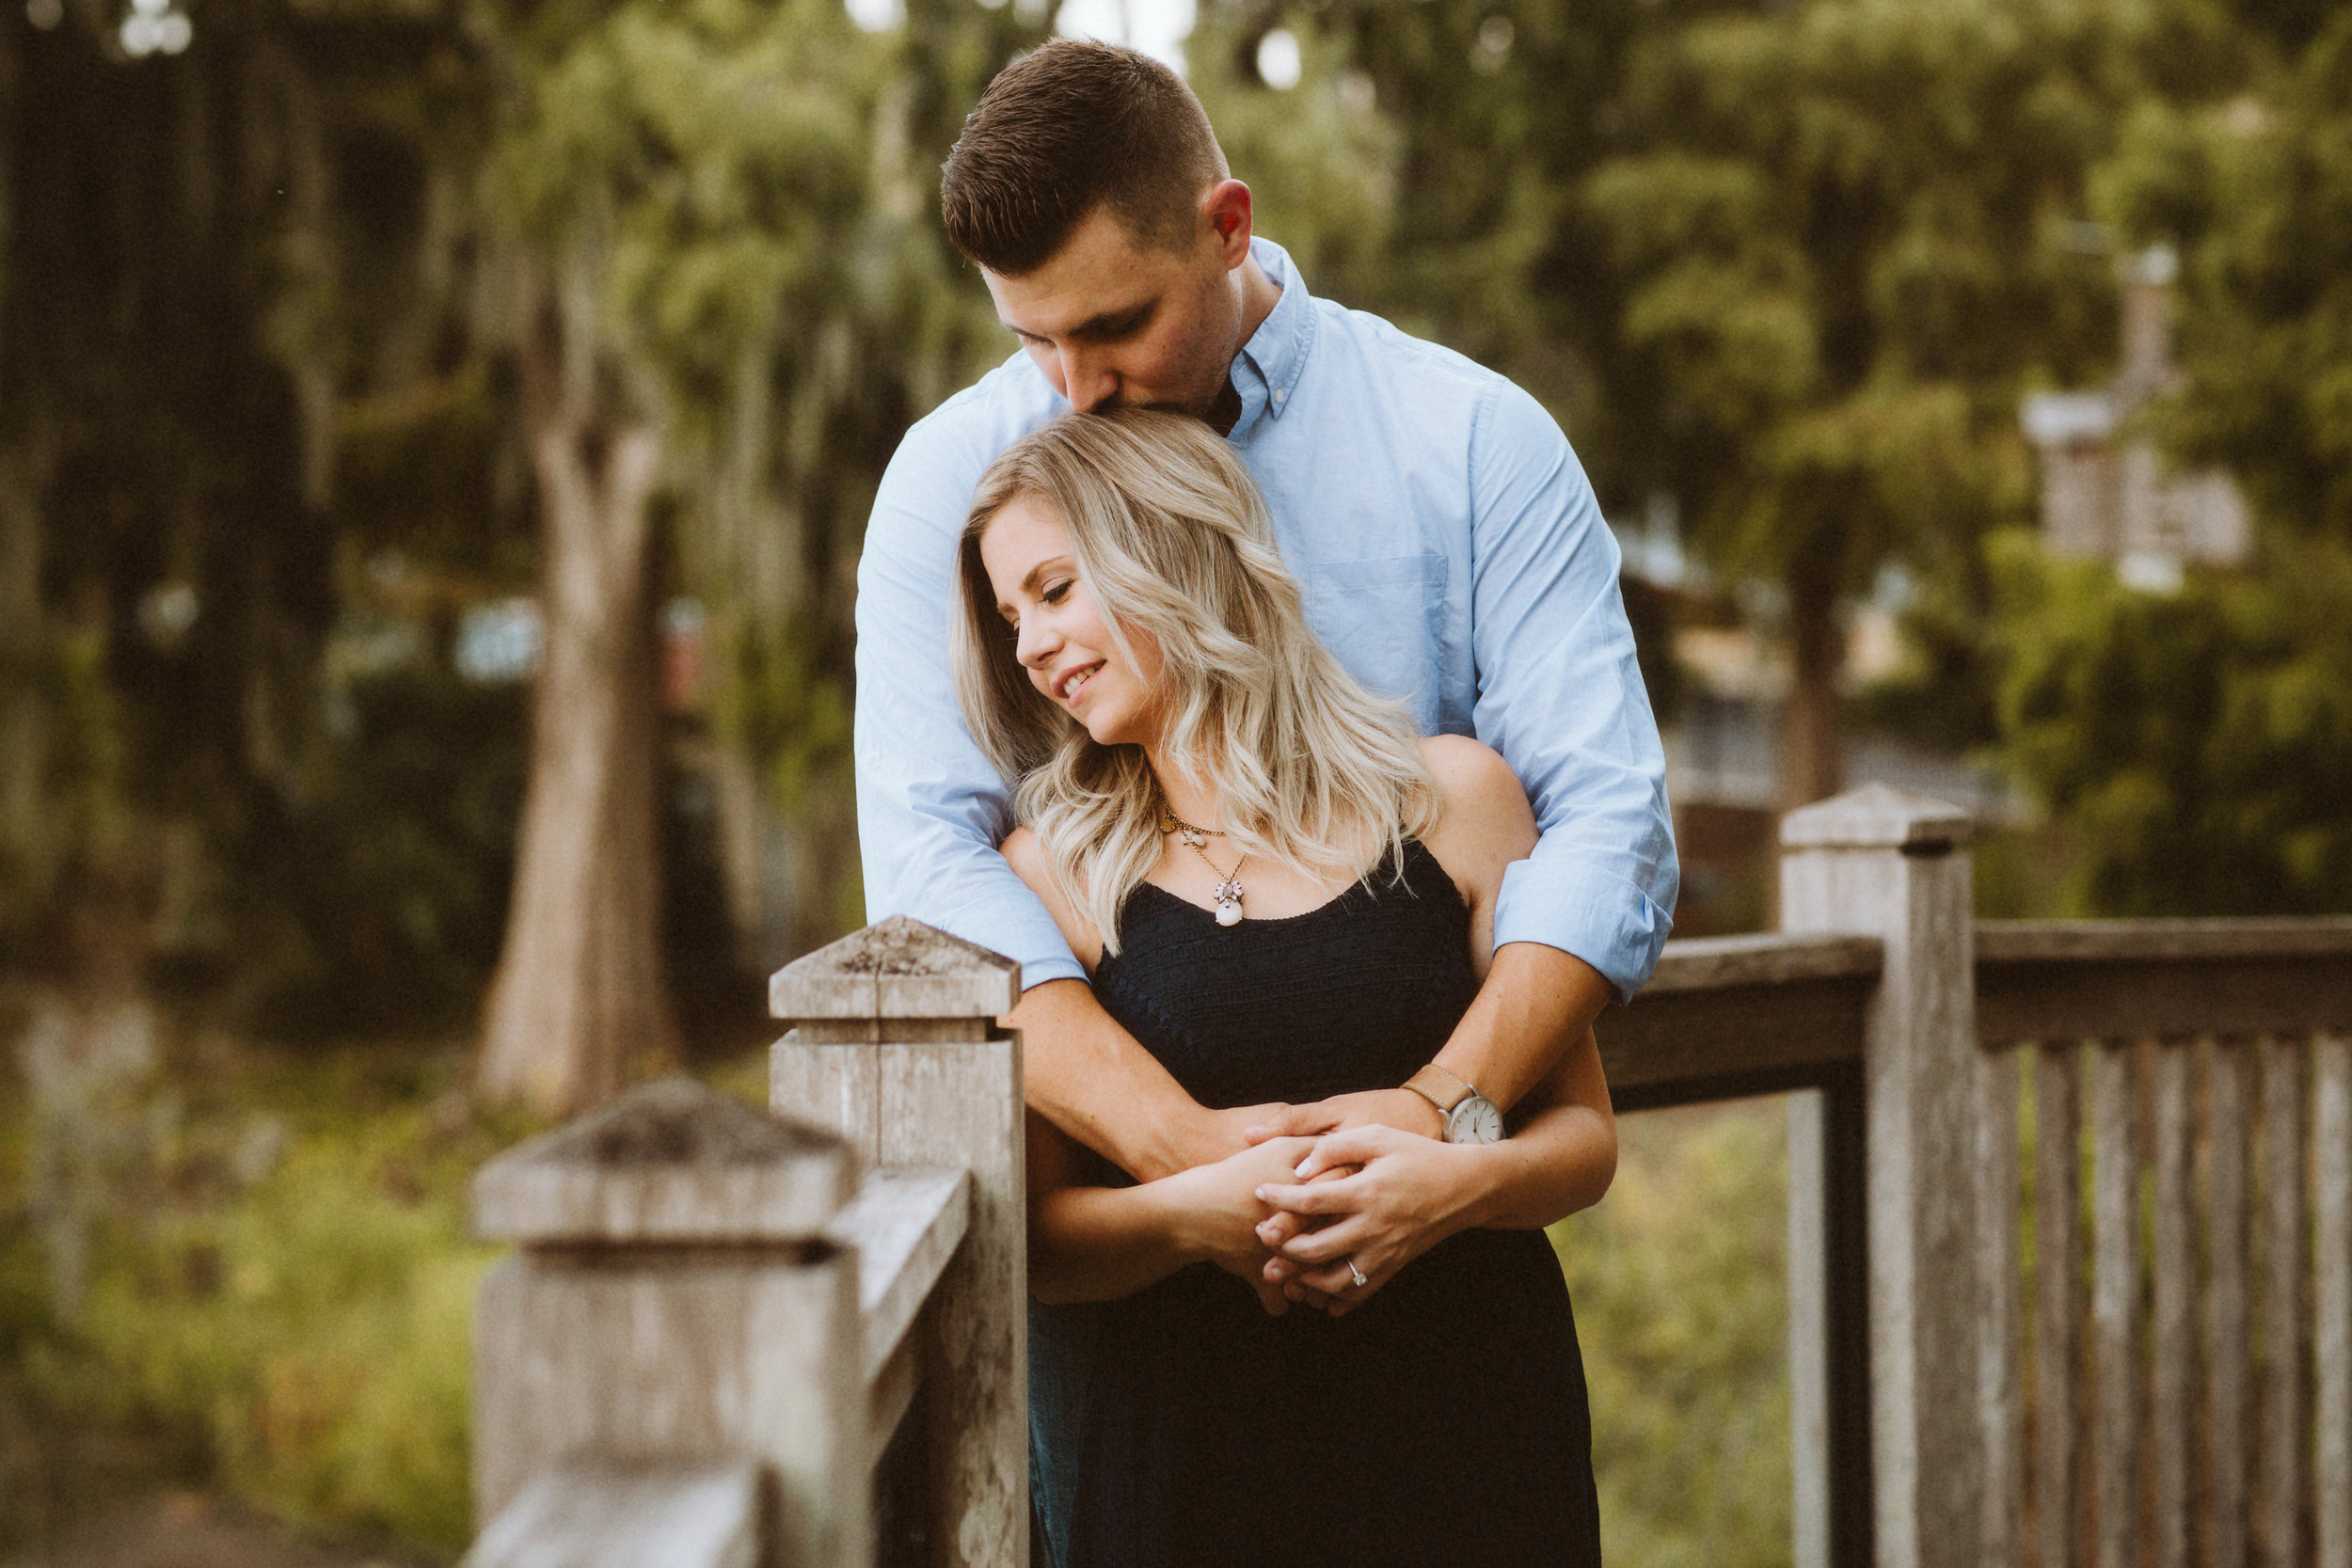 Engagement | Vanessa Boy Photography | vanessaboy.com |-46-2.com |final .jpg